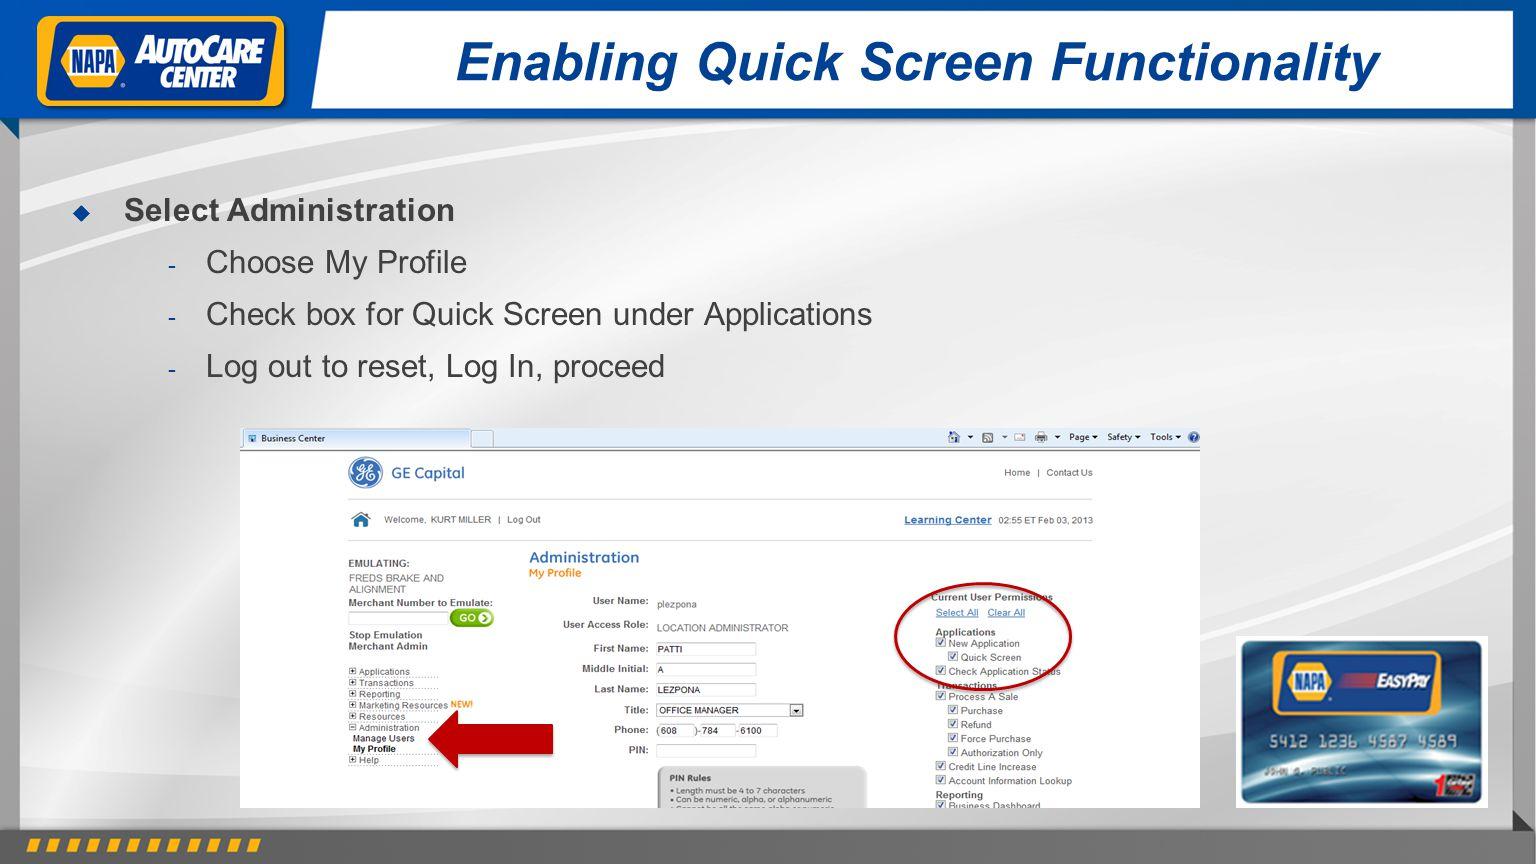 Enabling Quick Screen Functionality